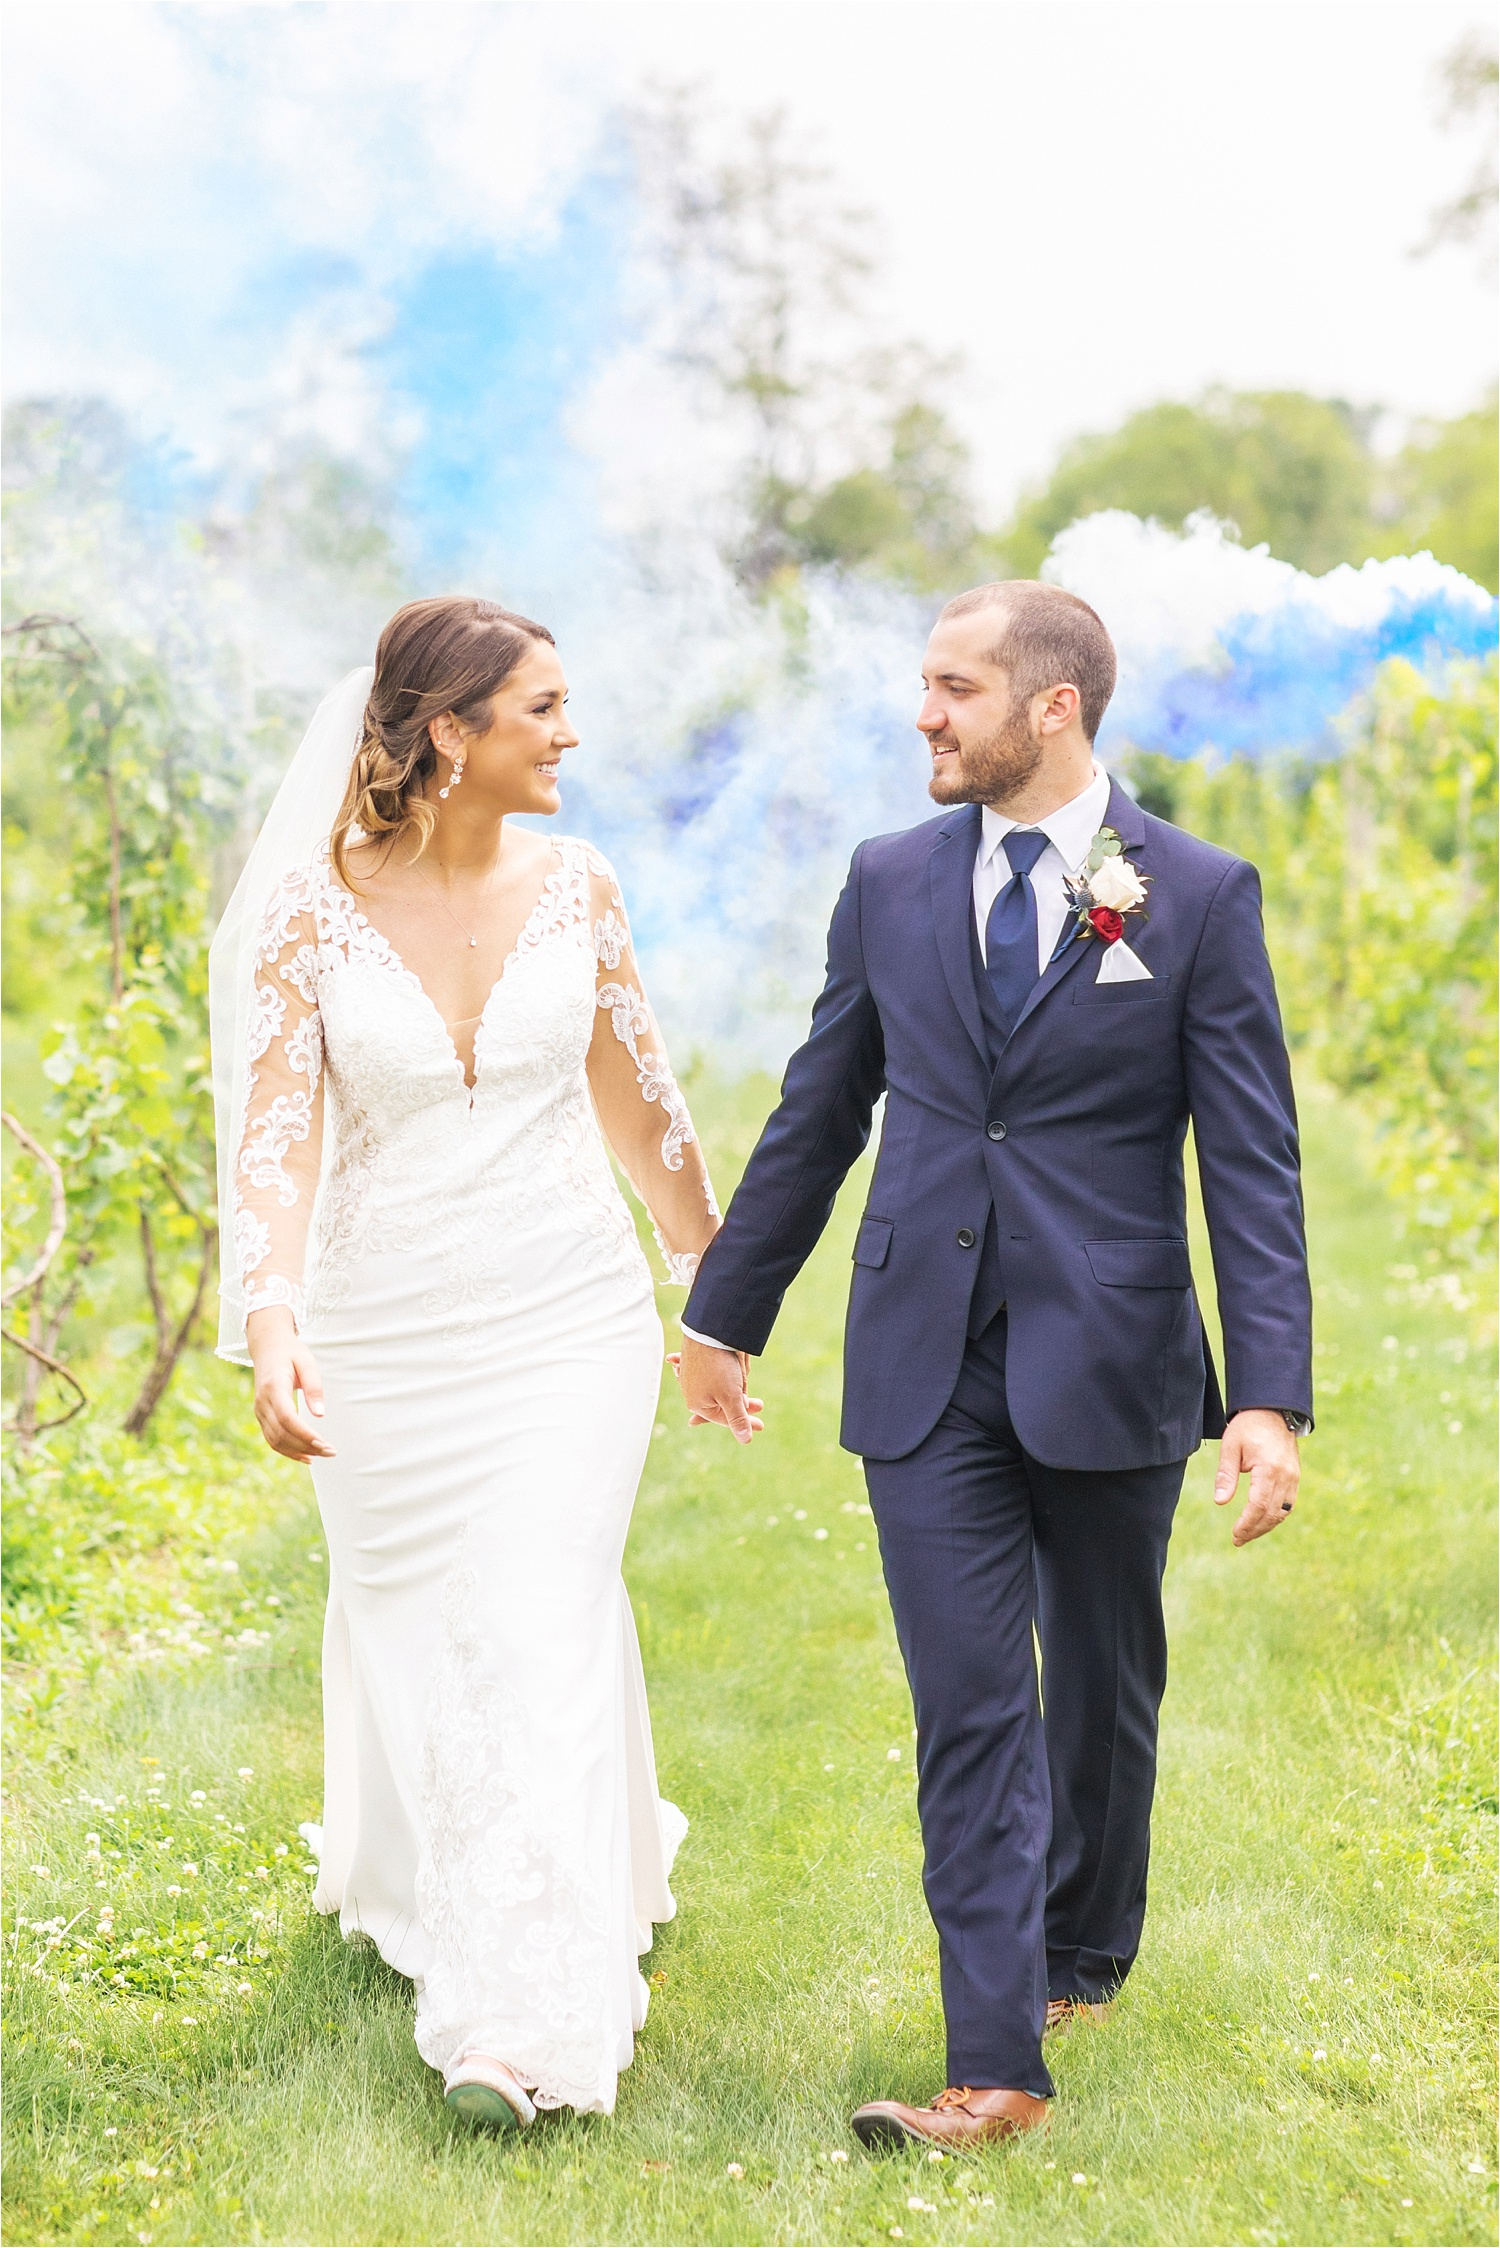 smoke bomb summer wedding at the vineyards at pine lake